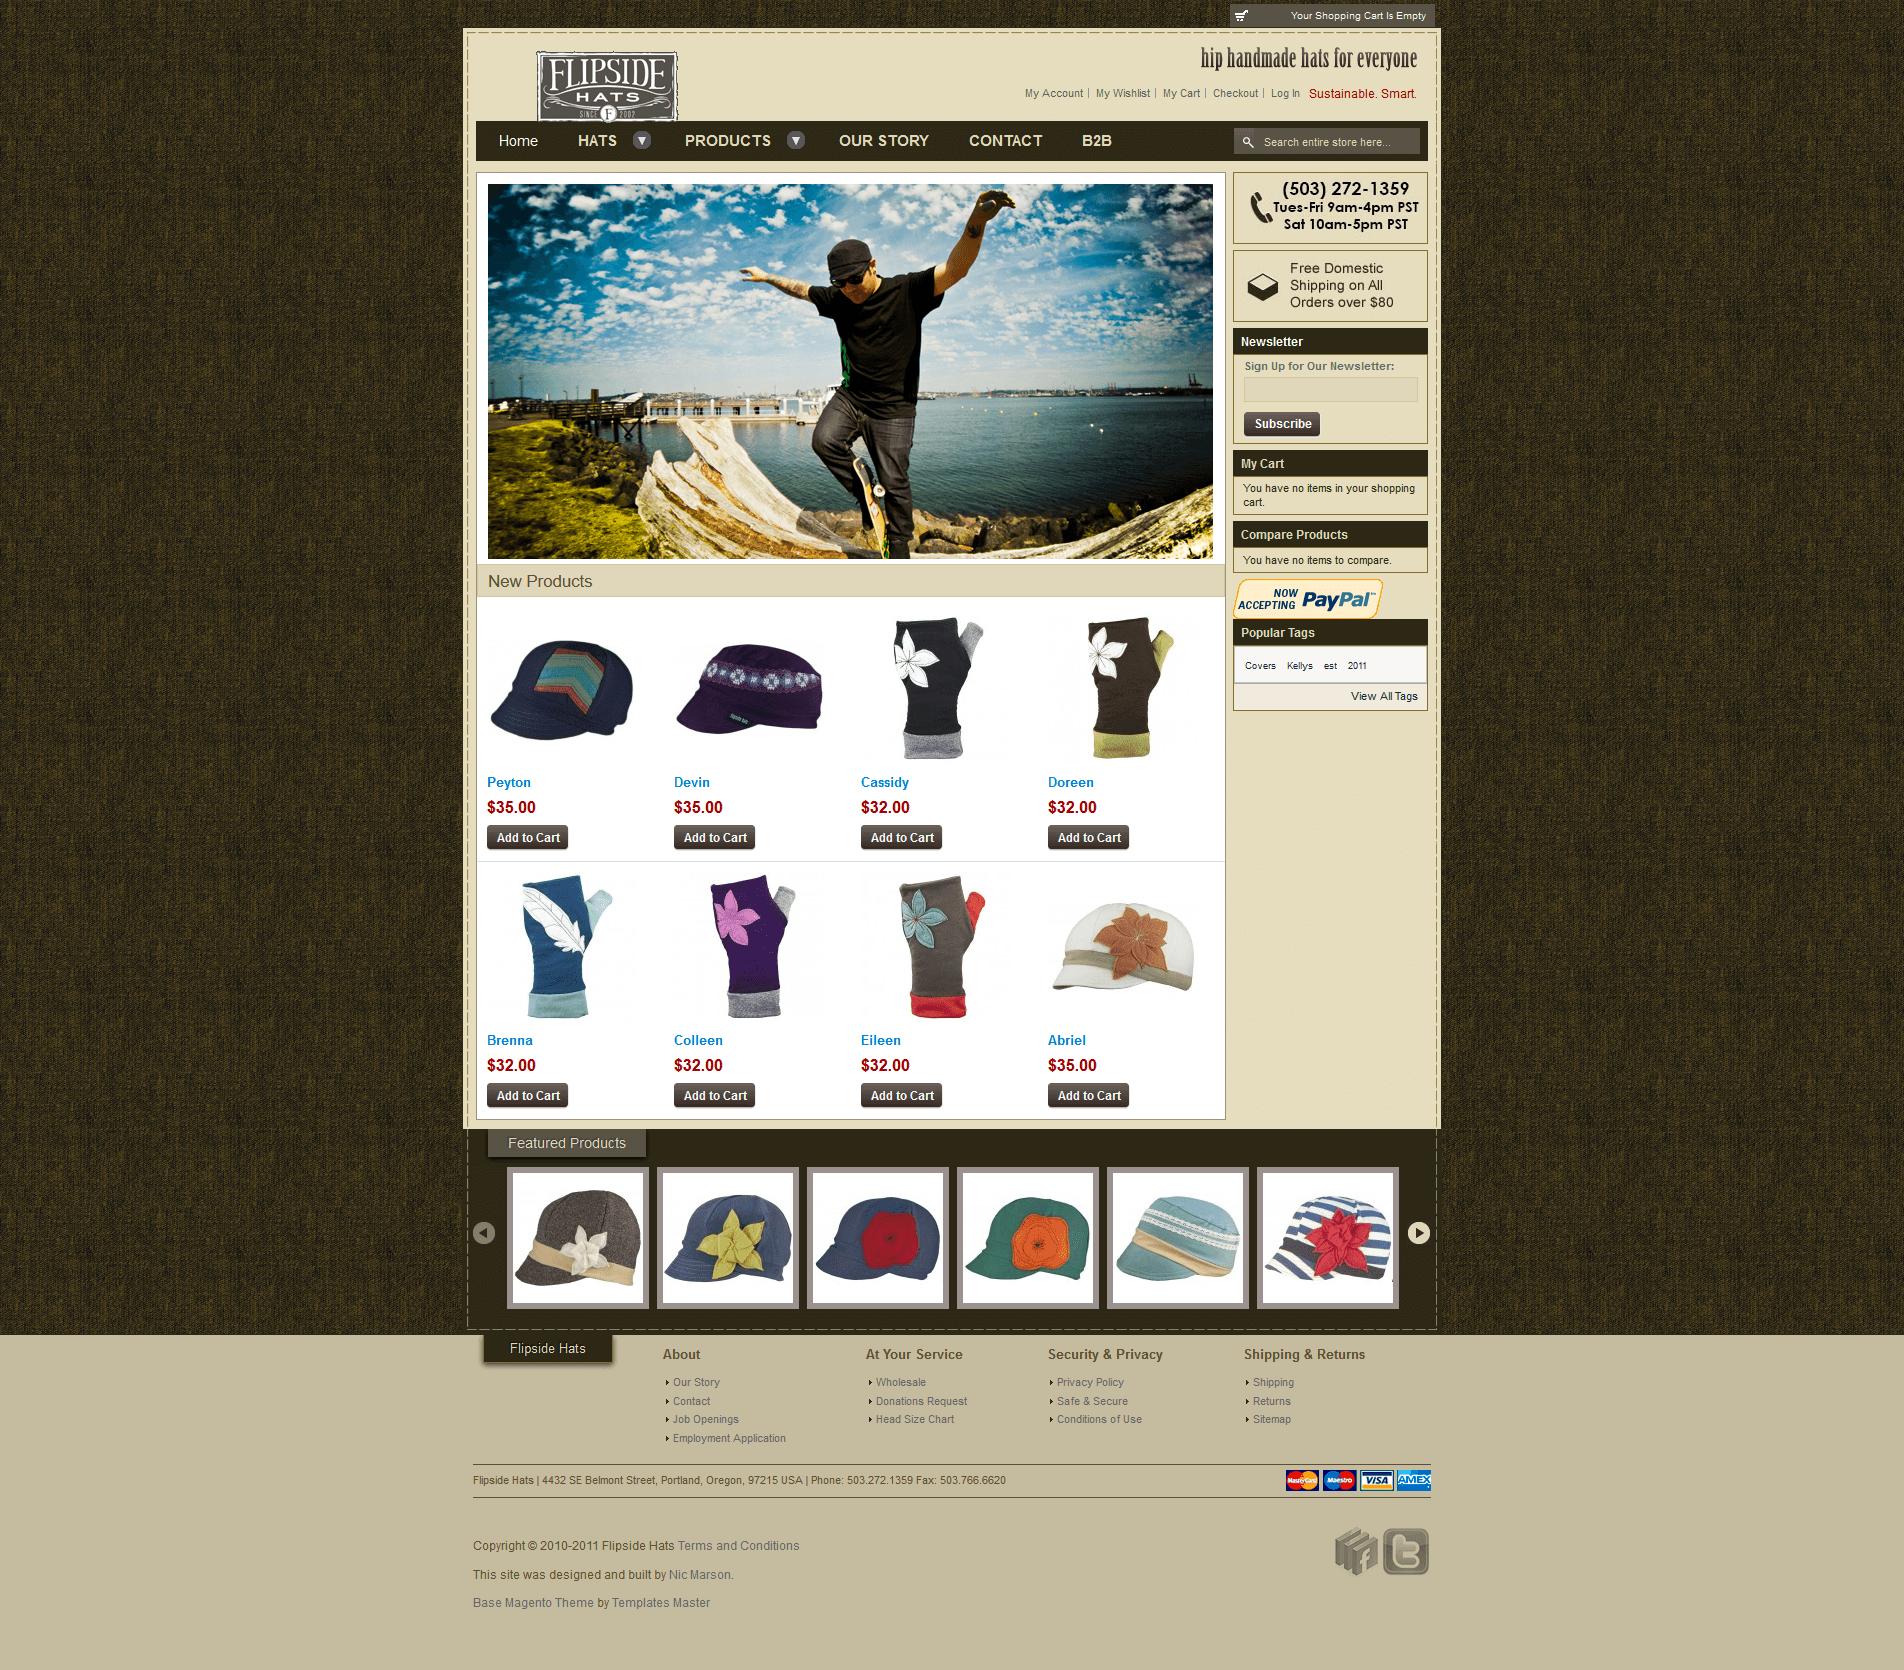 Flipside Hats v1 home page